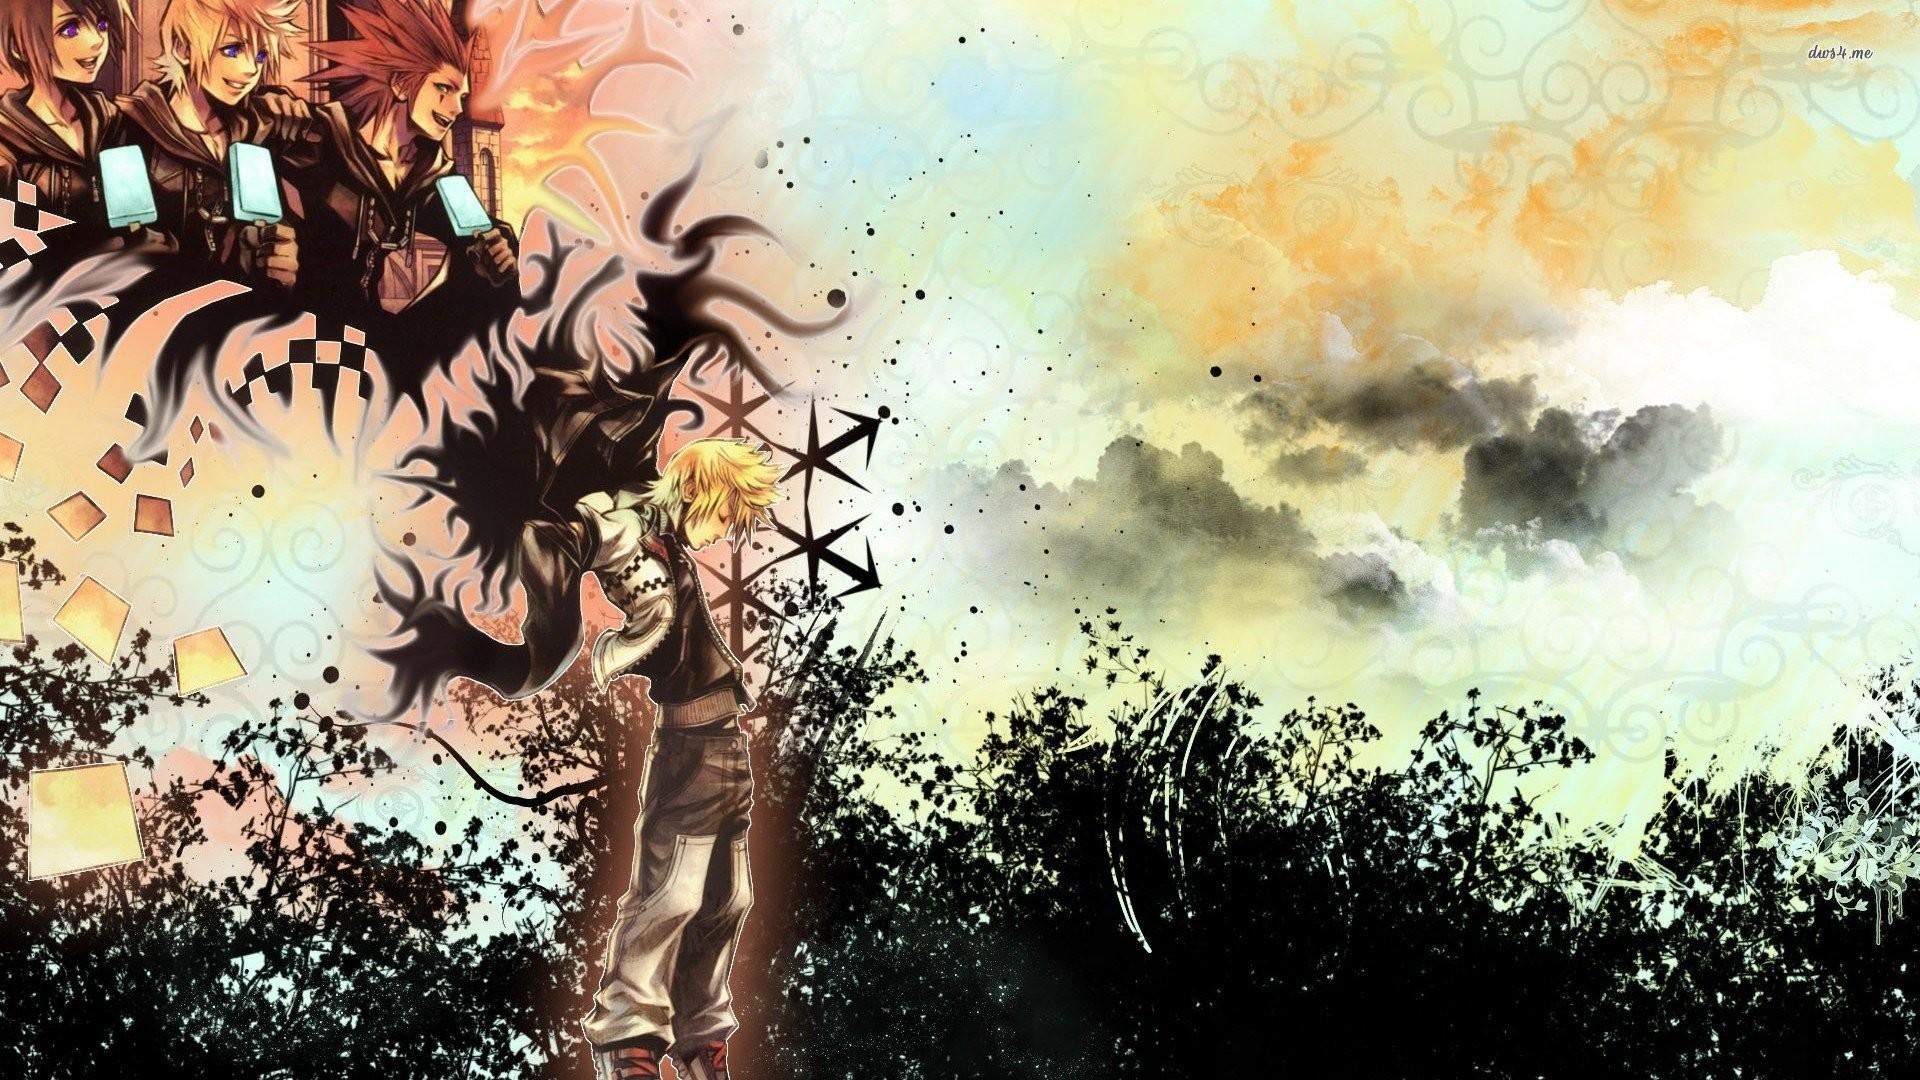 Kingdom Hearts 3582 Days Wallpaper 61 Images